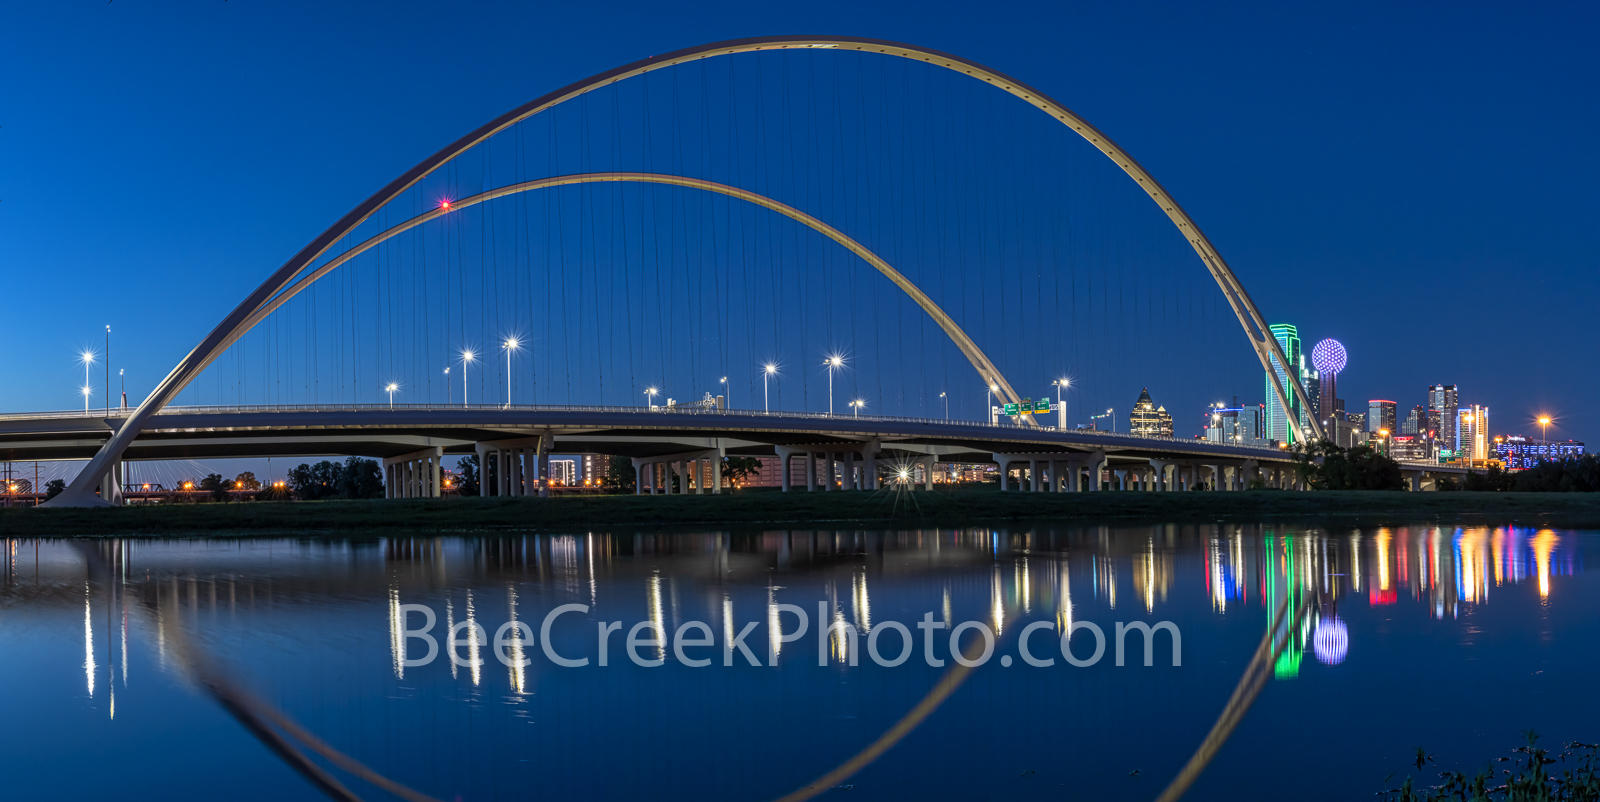 Dallas McDermontt bridge Reflection, Dallas, downtown dallas, skyline, cityscape, Margaret McDermott Bridge, twilight, downtown, river, bridge, Trinity River,  Trinity project, Santiago Calatrava, Pan, photo